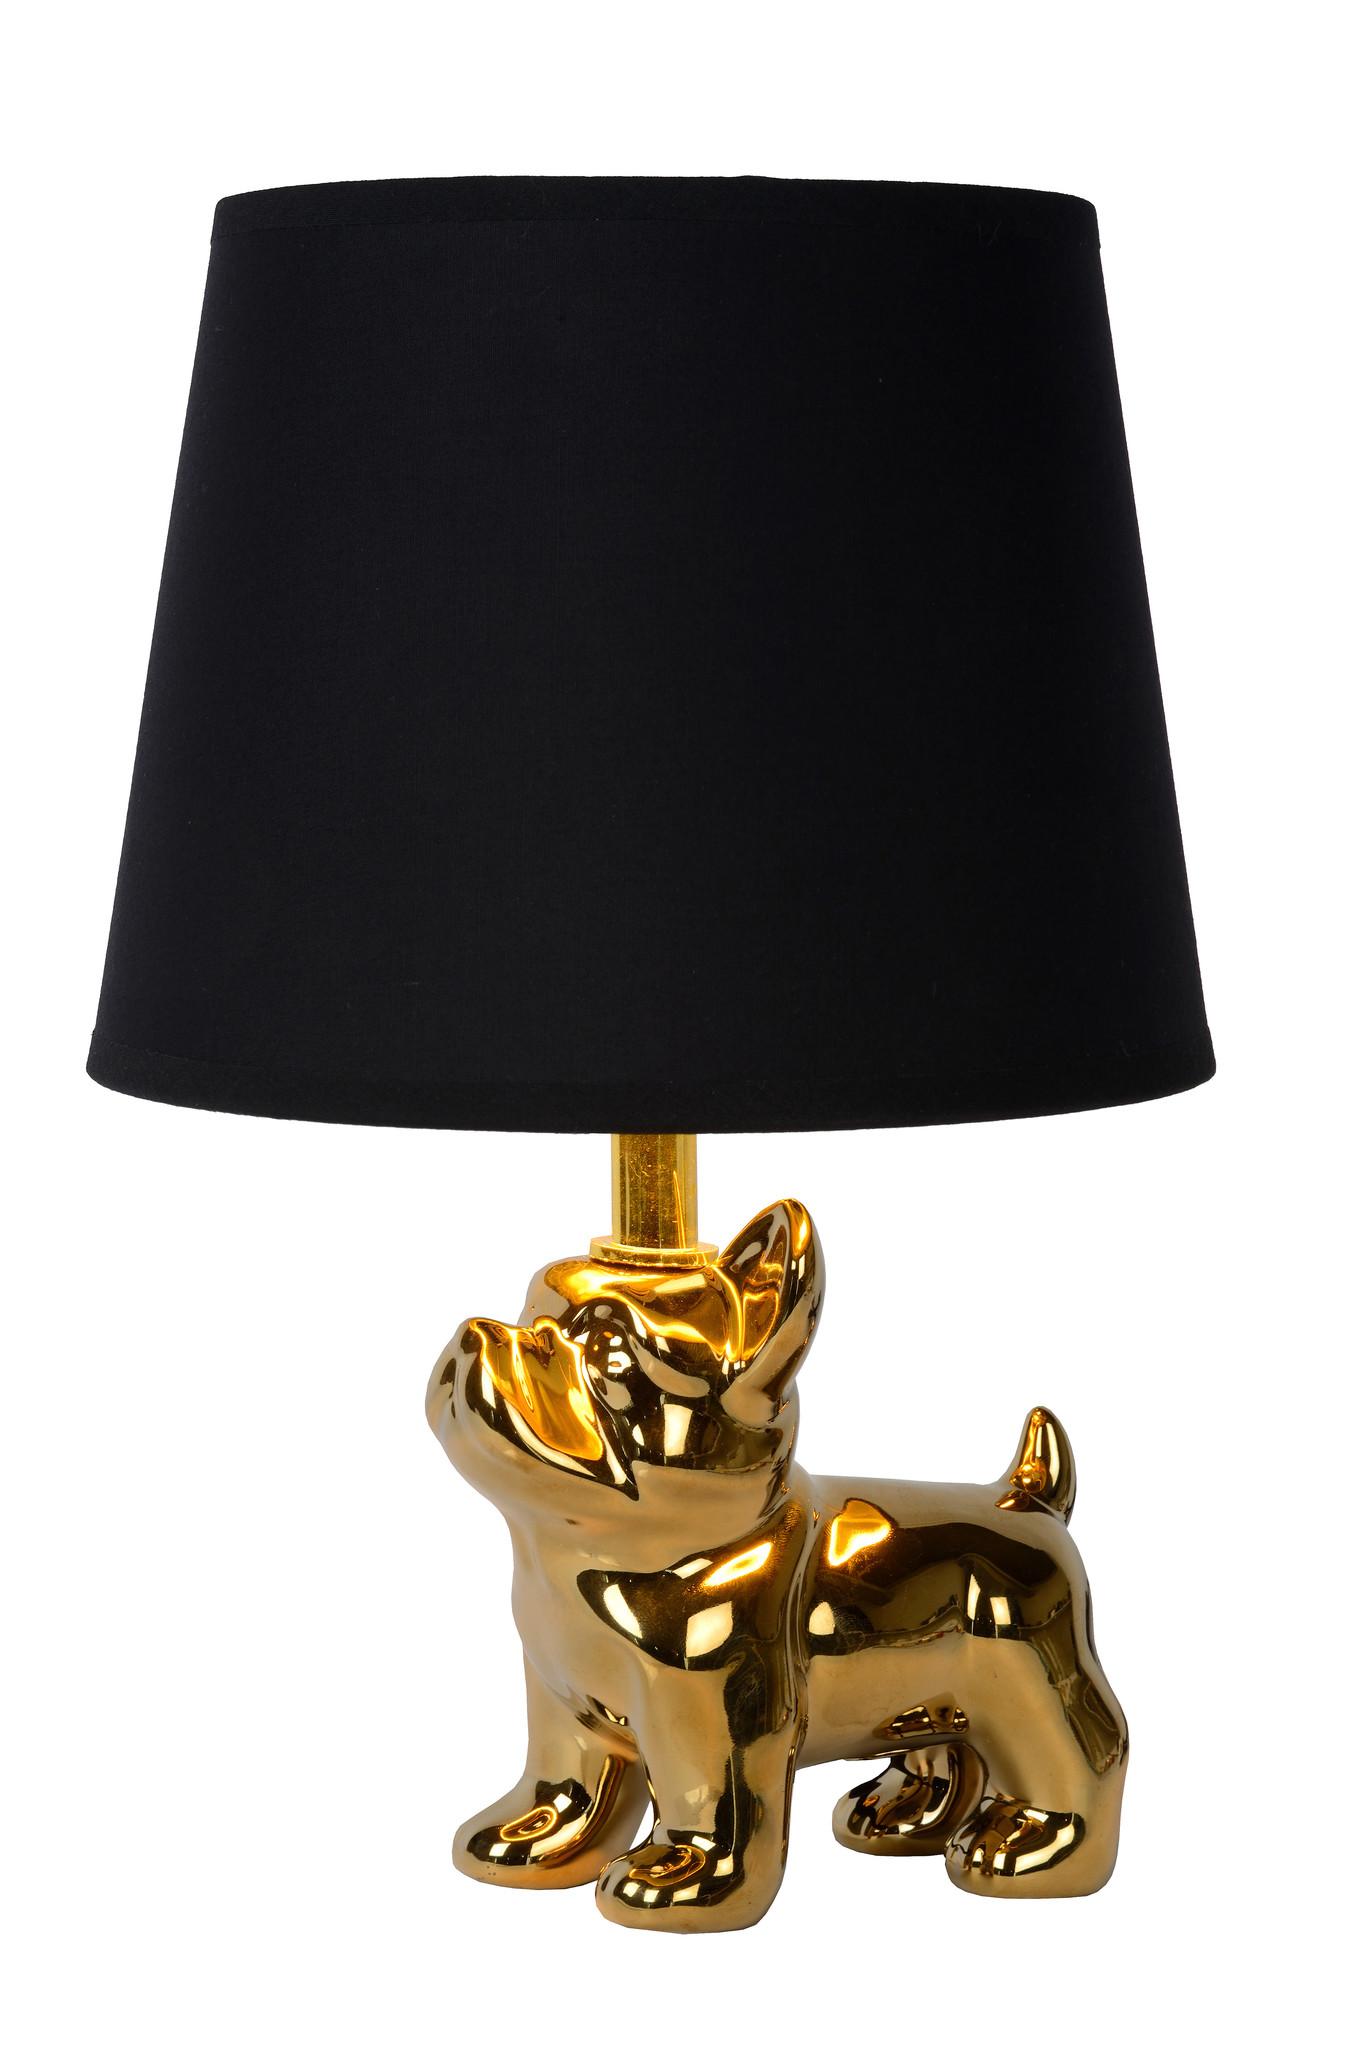 Lucide SIR WIN. Tafellamp-Goud-1xE14-40W-Porsel.